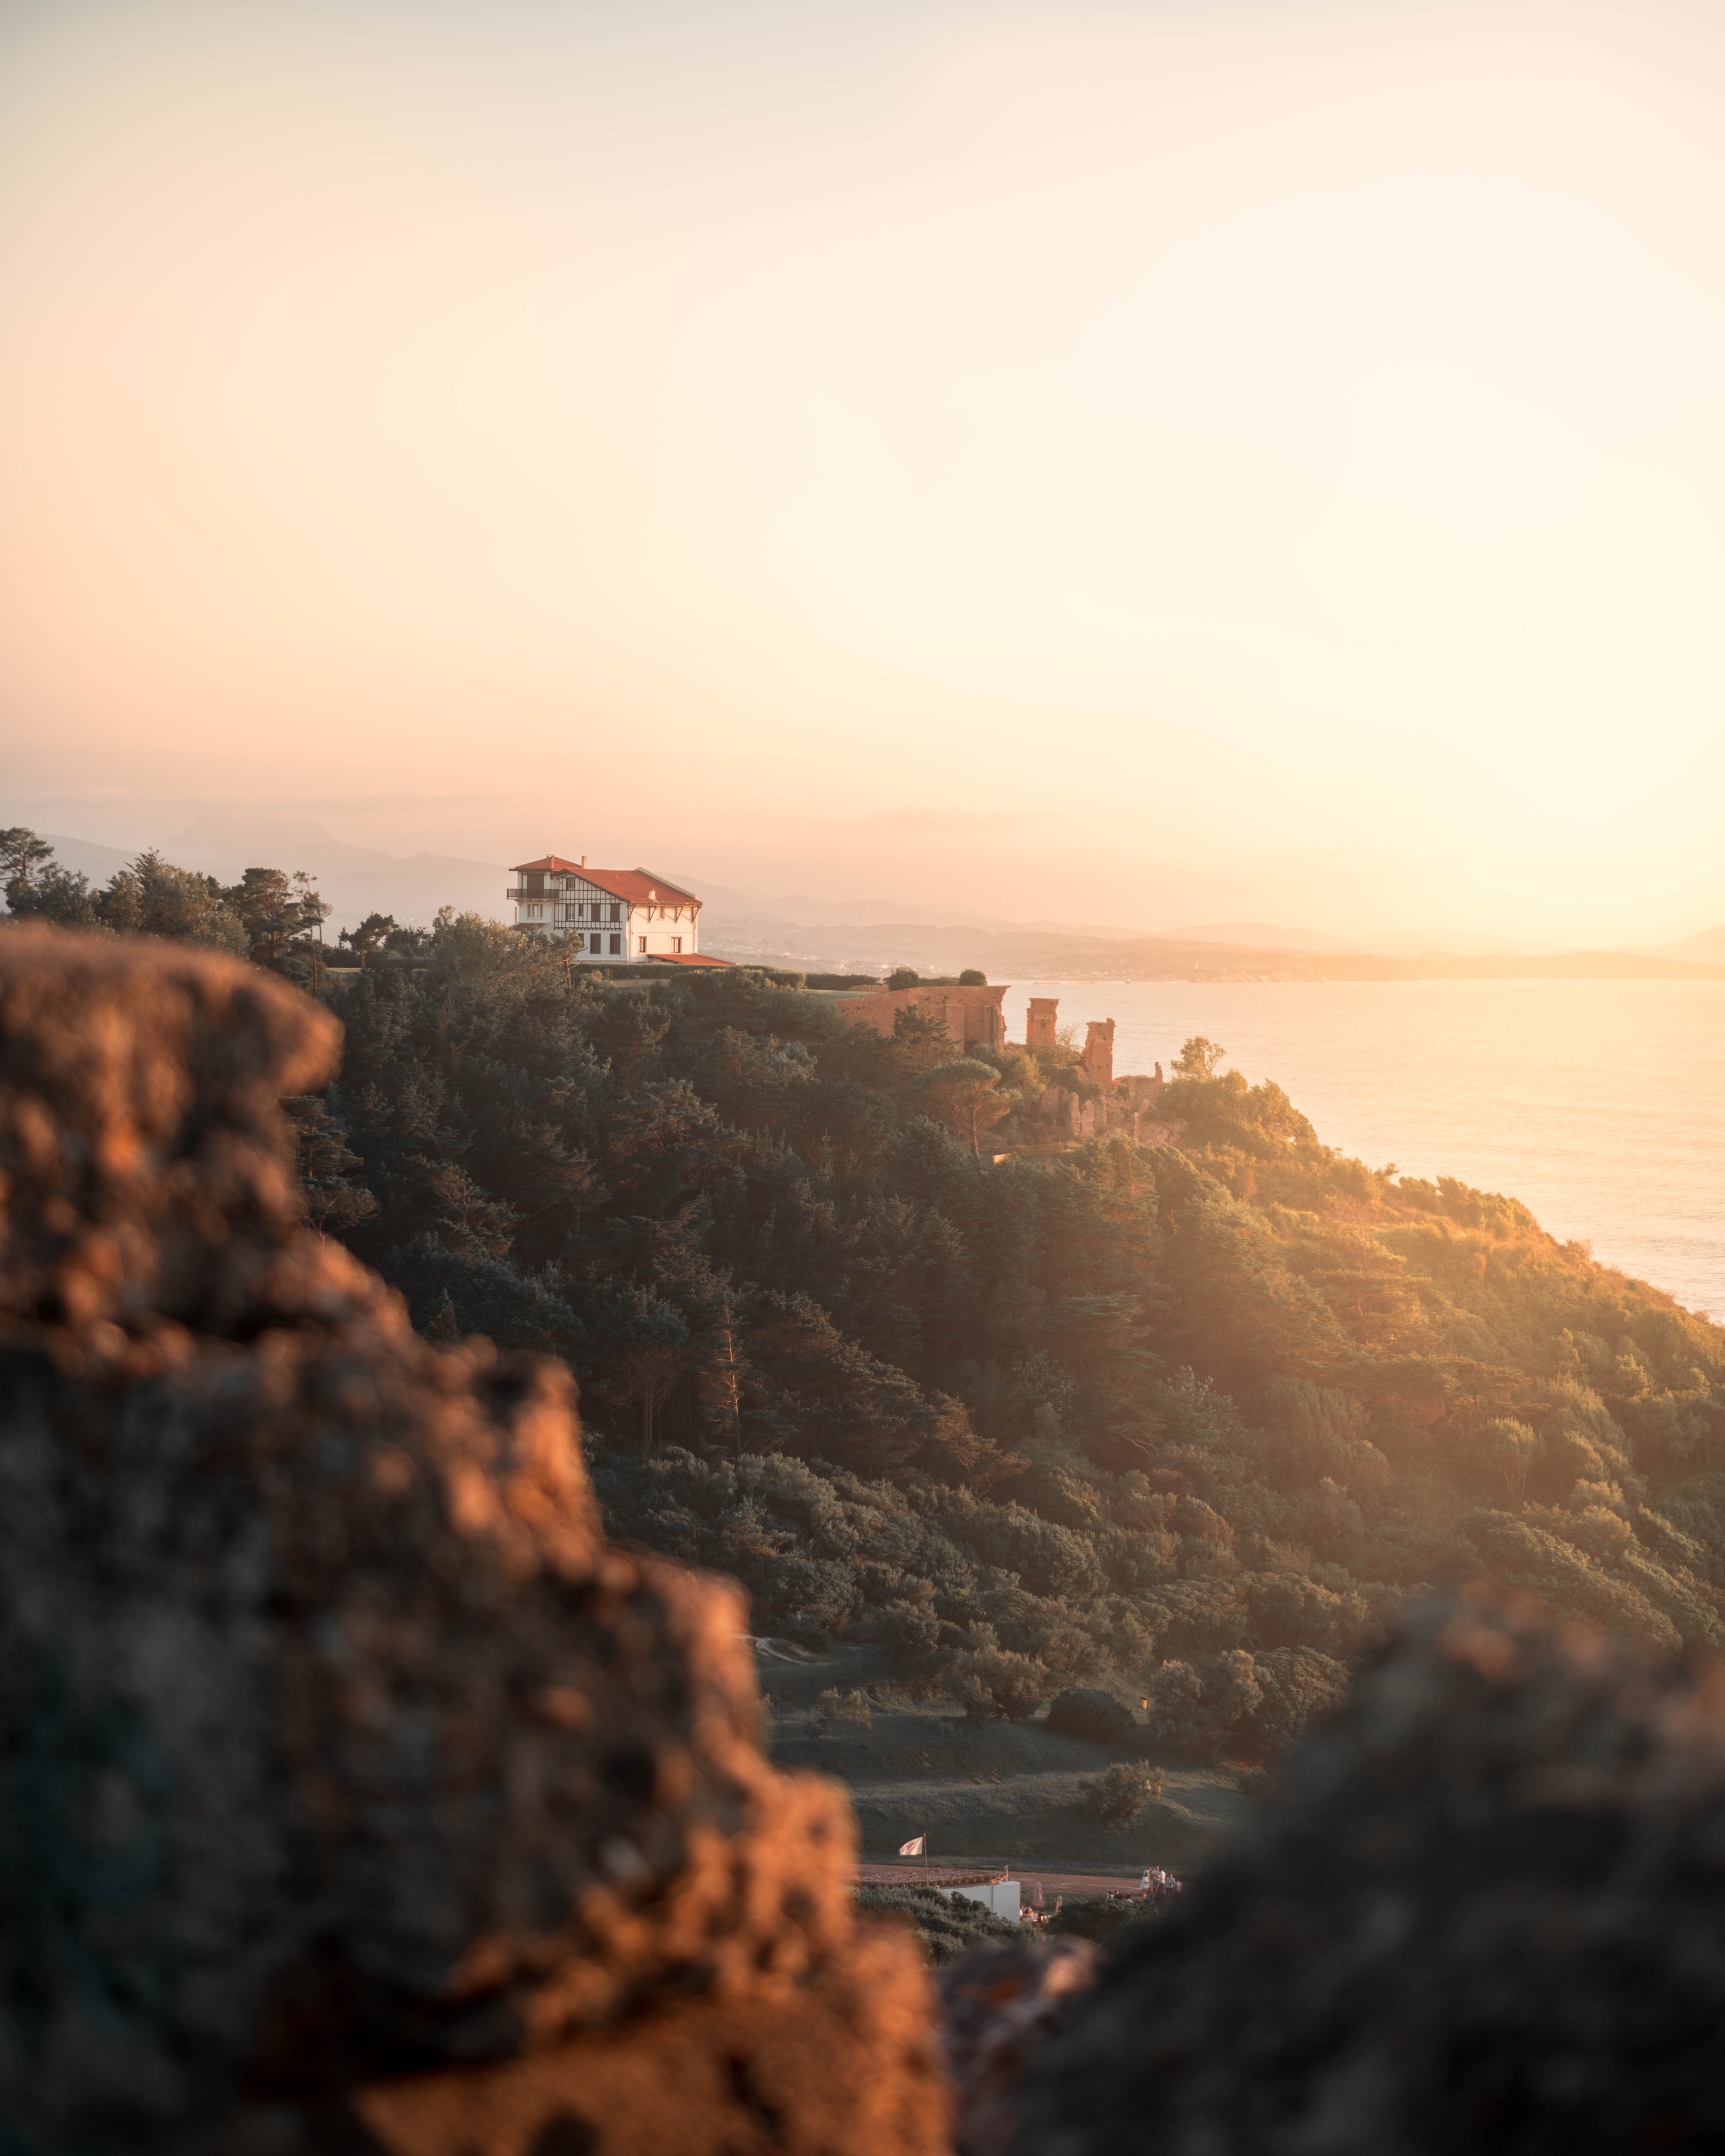 concrete castle on hill beside body of water